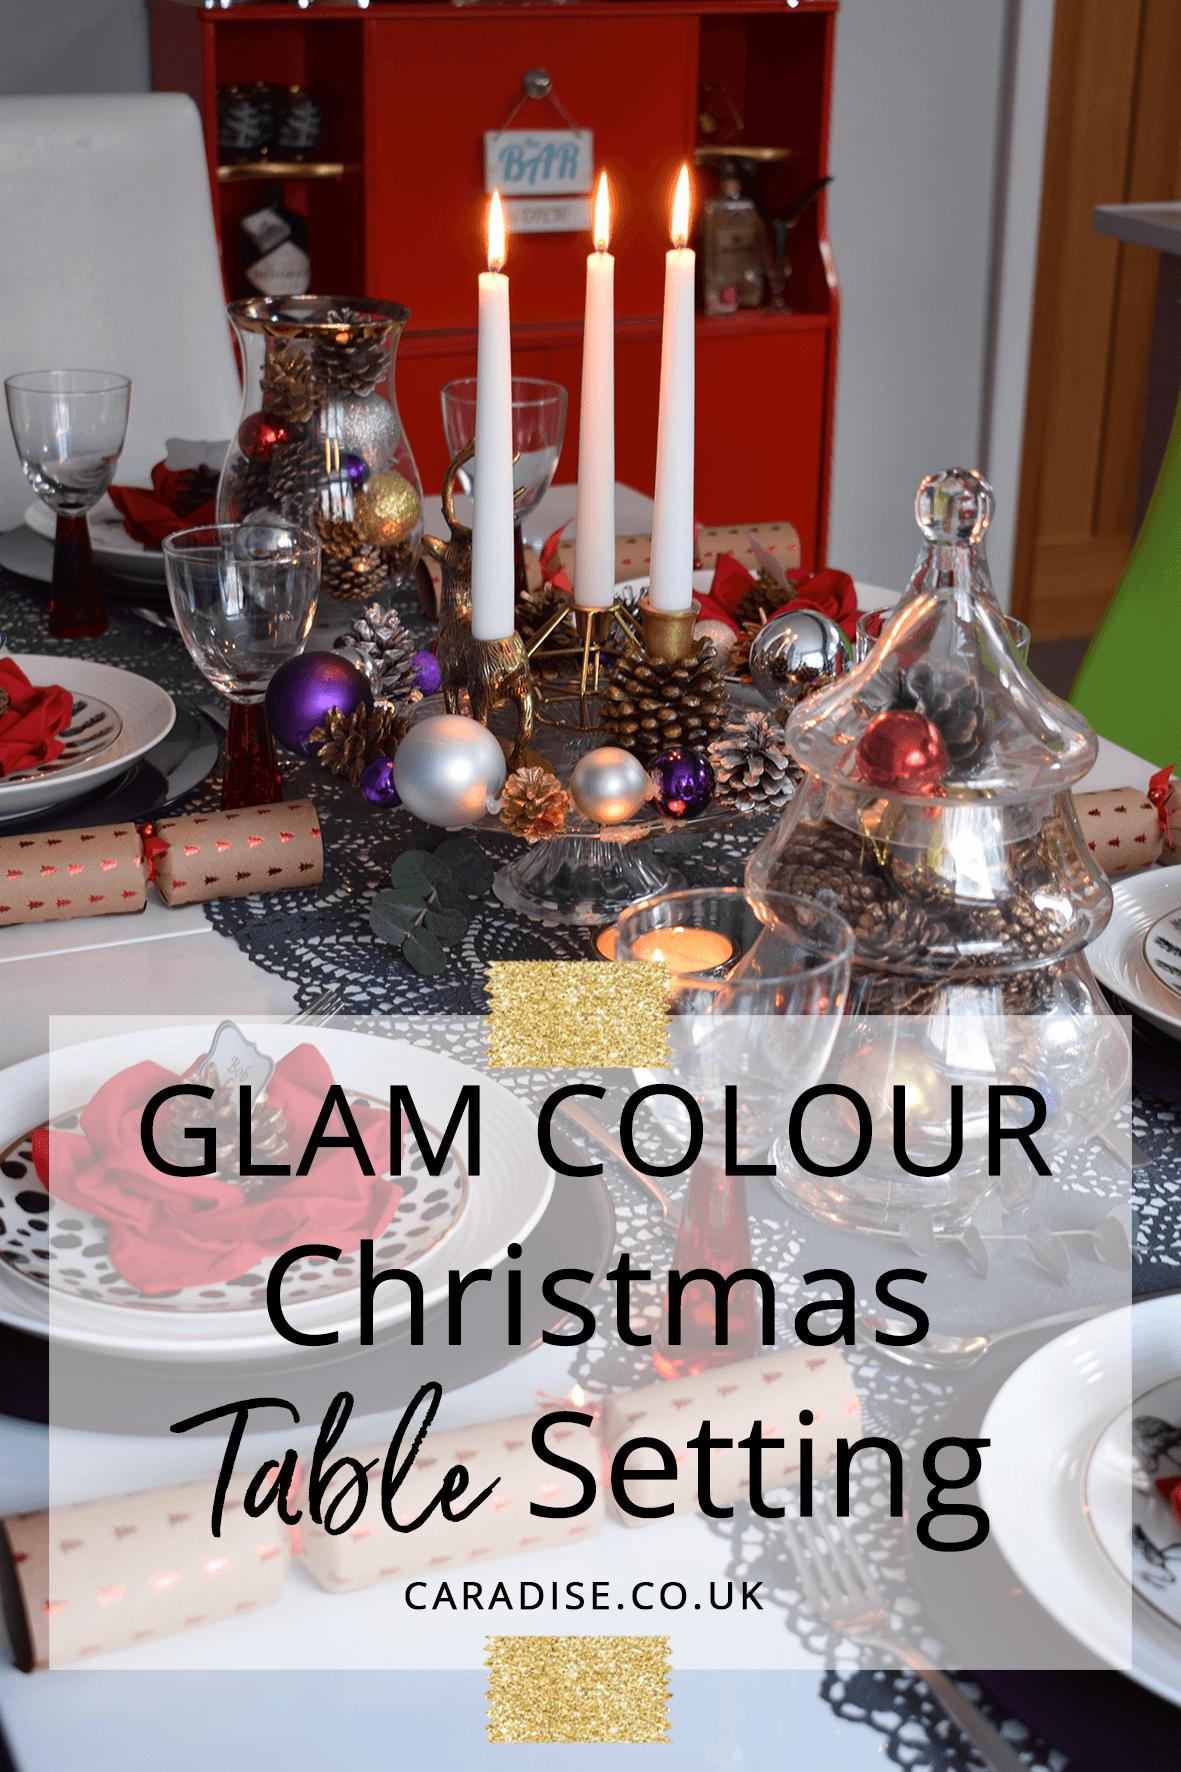 Glam Colour Christmas Table Setting